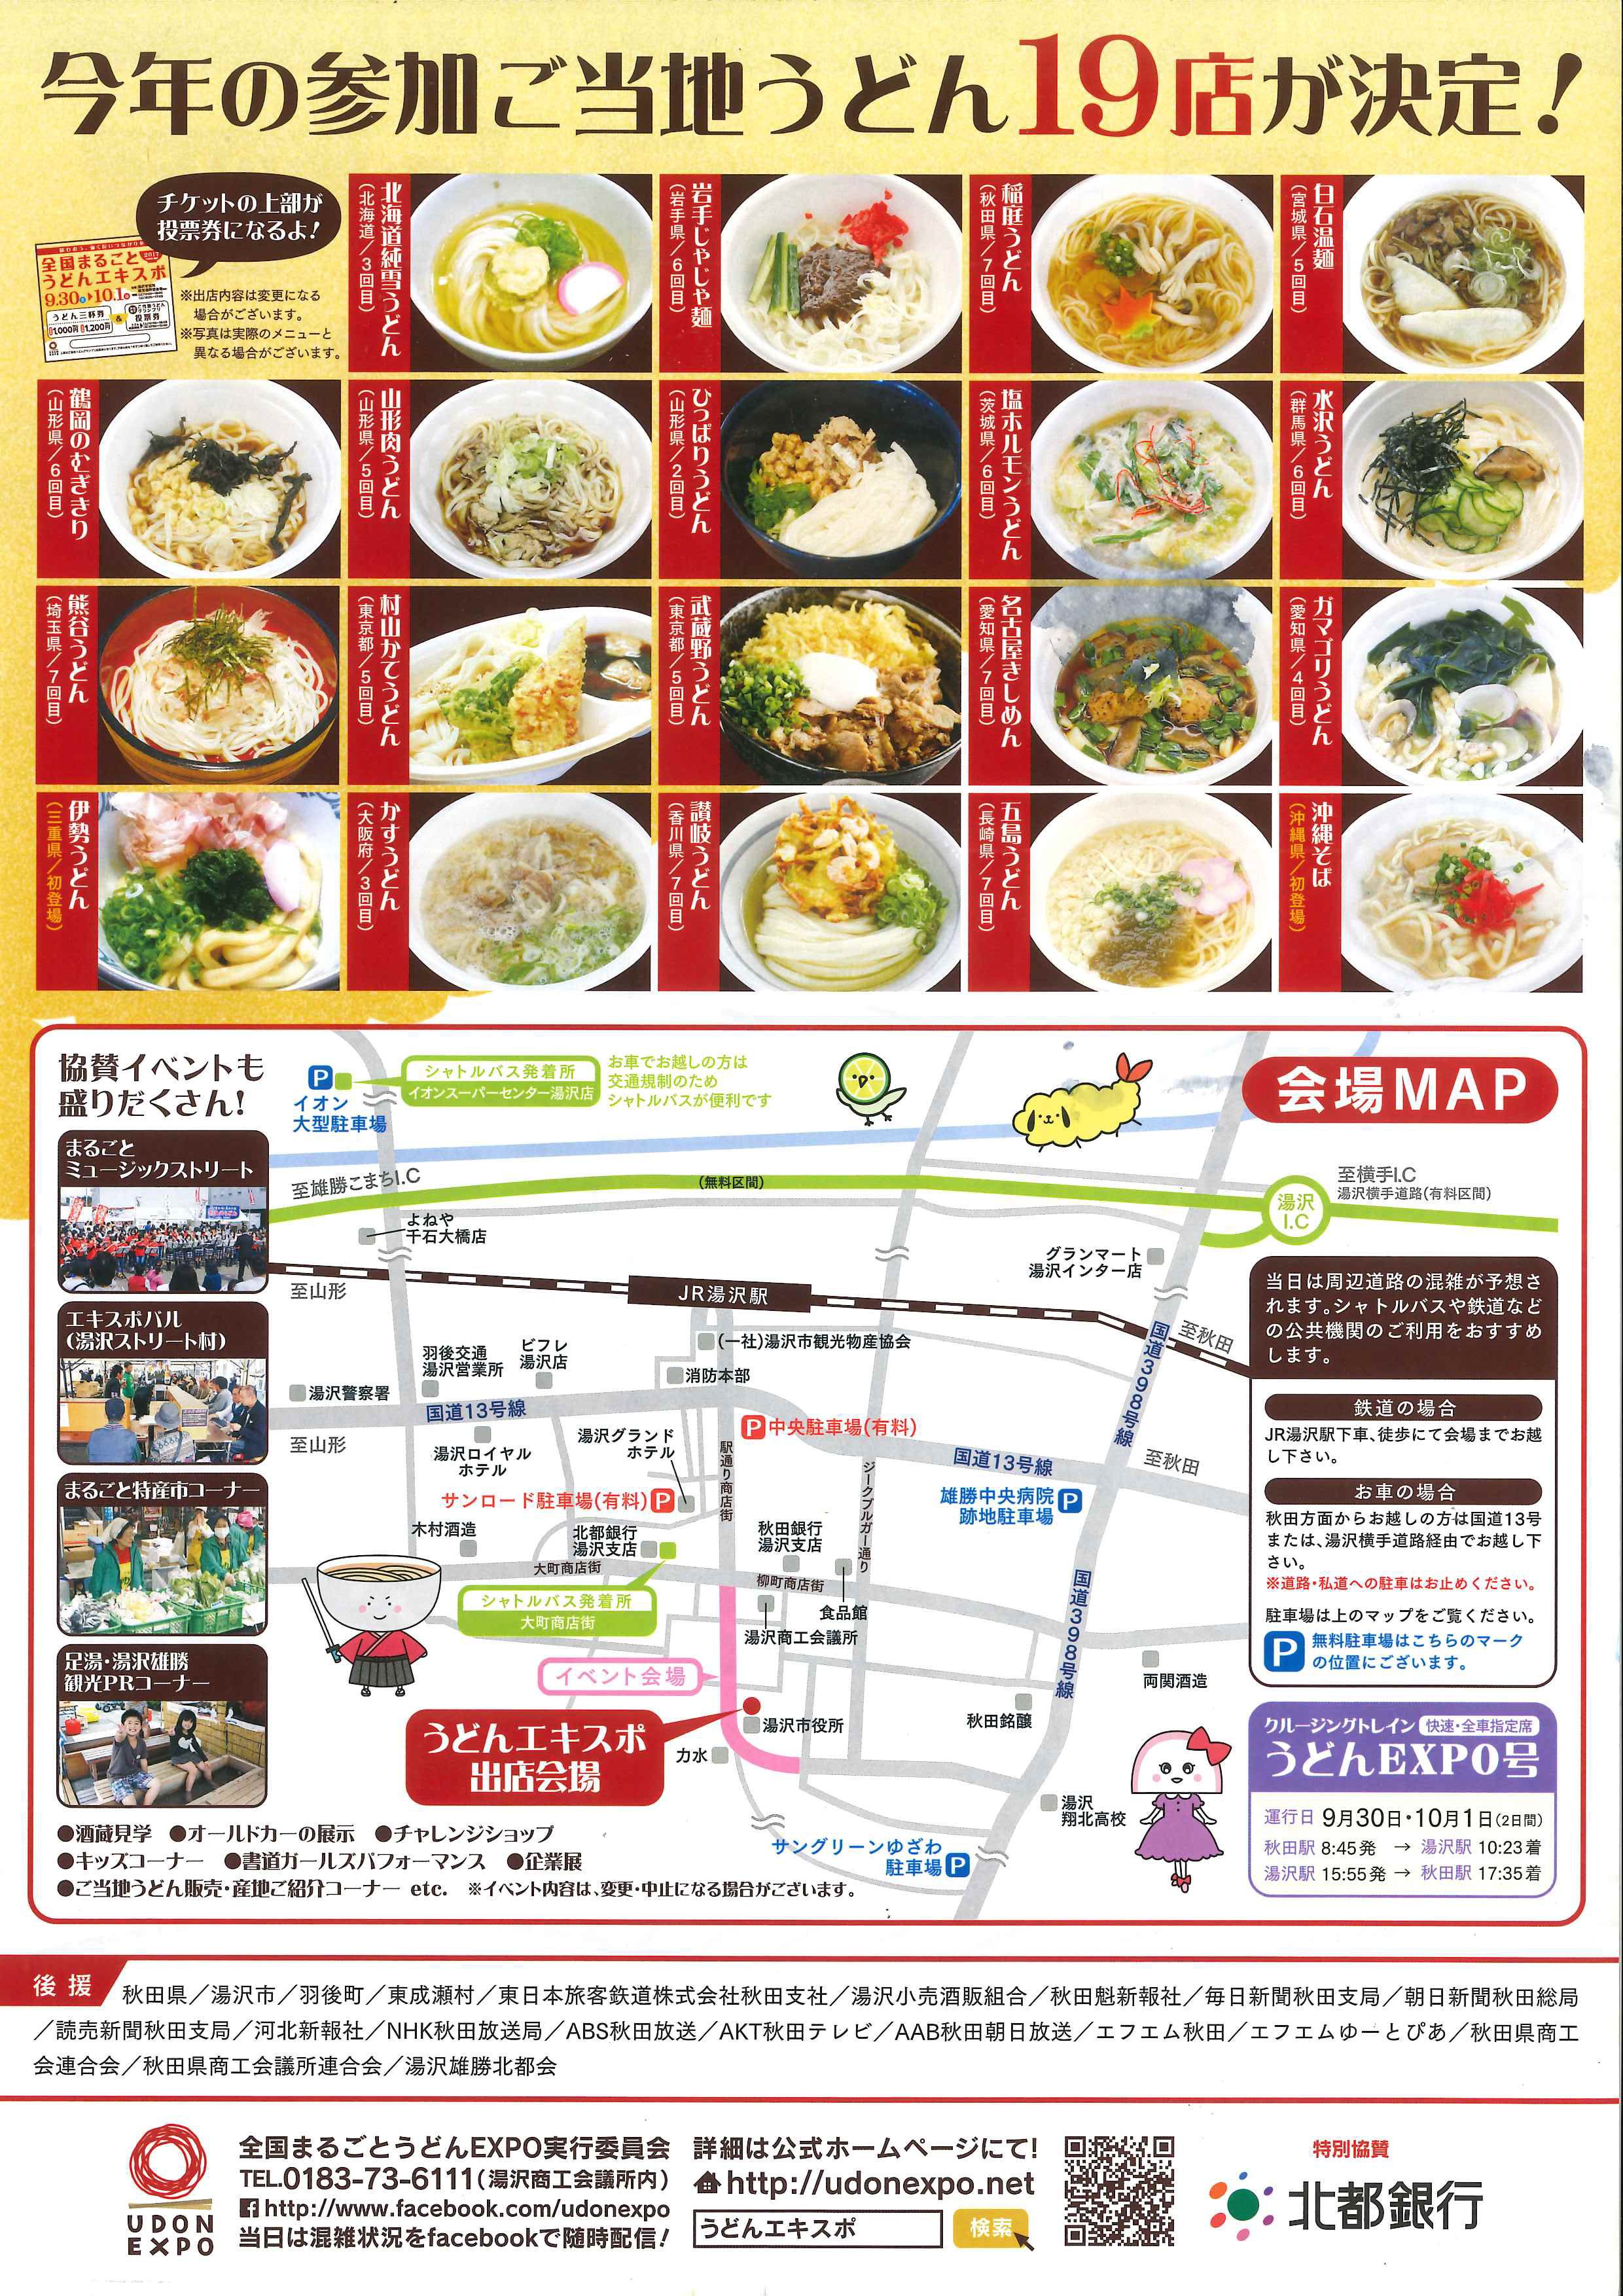 http://www.fukukomachi.com/blog/photo/udon2.jpg